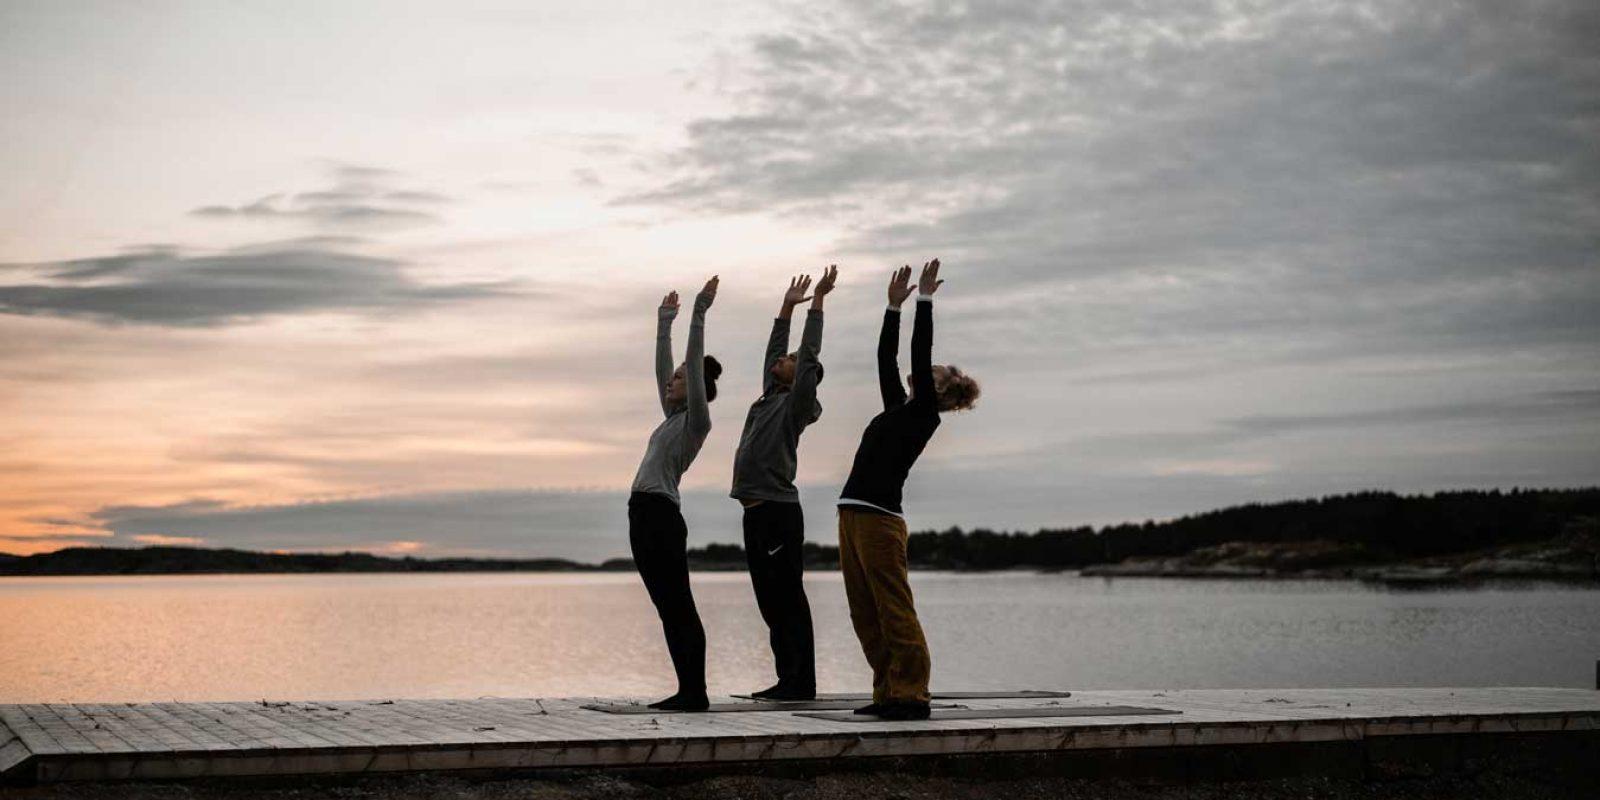 Yogaweekend på Västkusten i Sverige